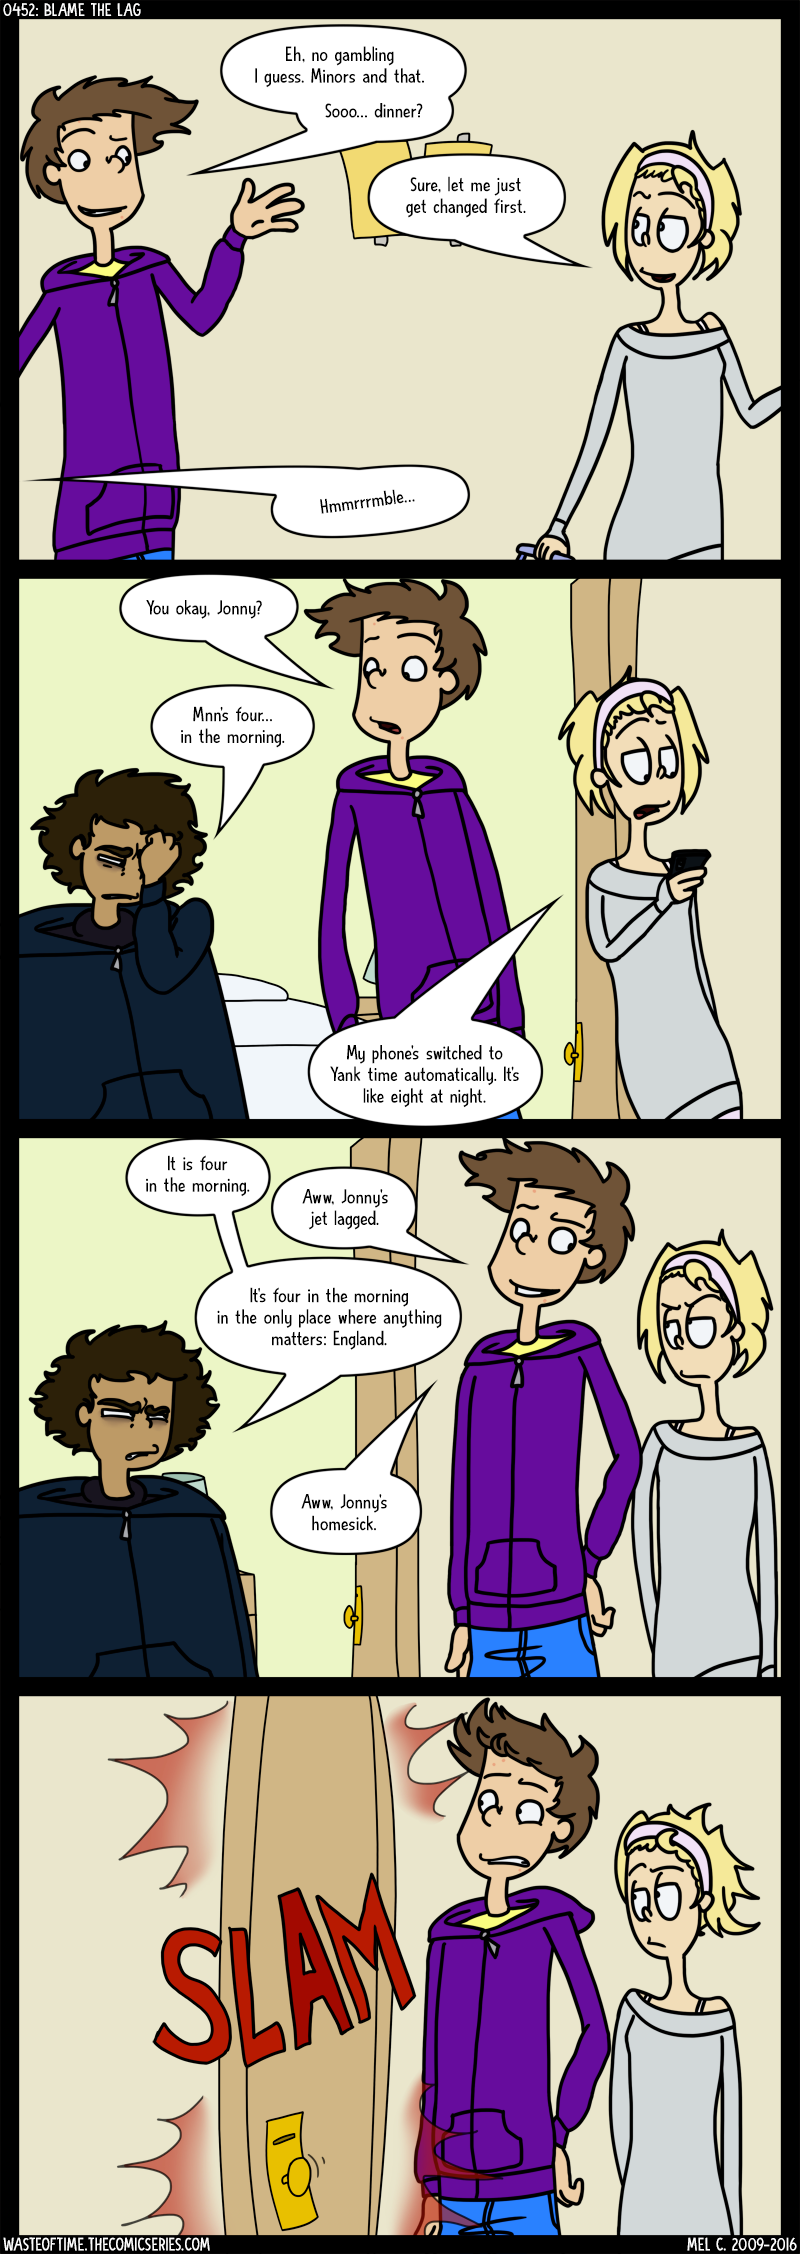 0352: Blame the Lag